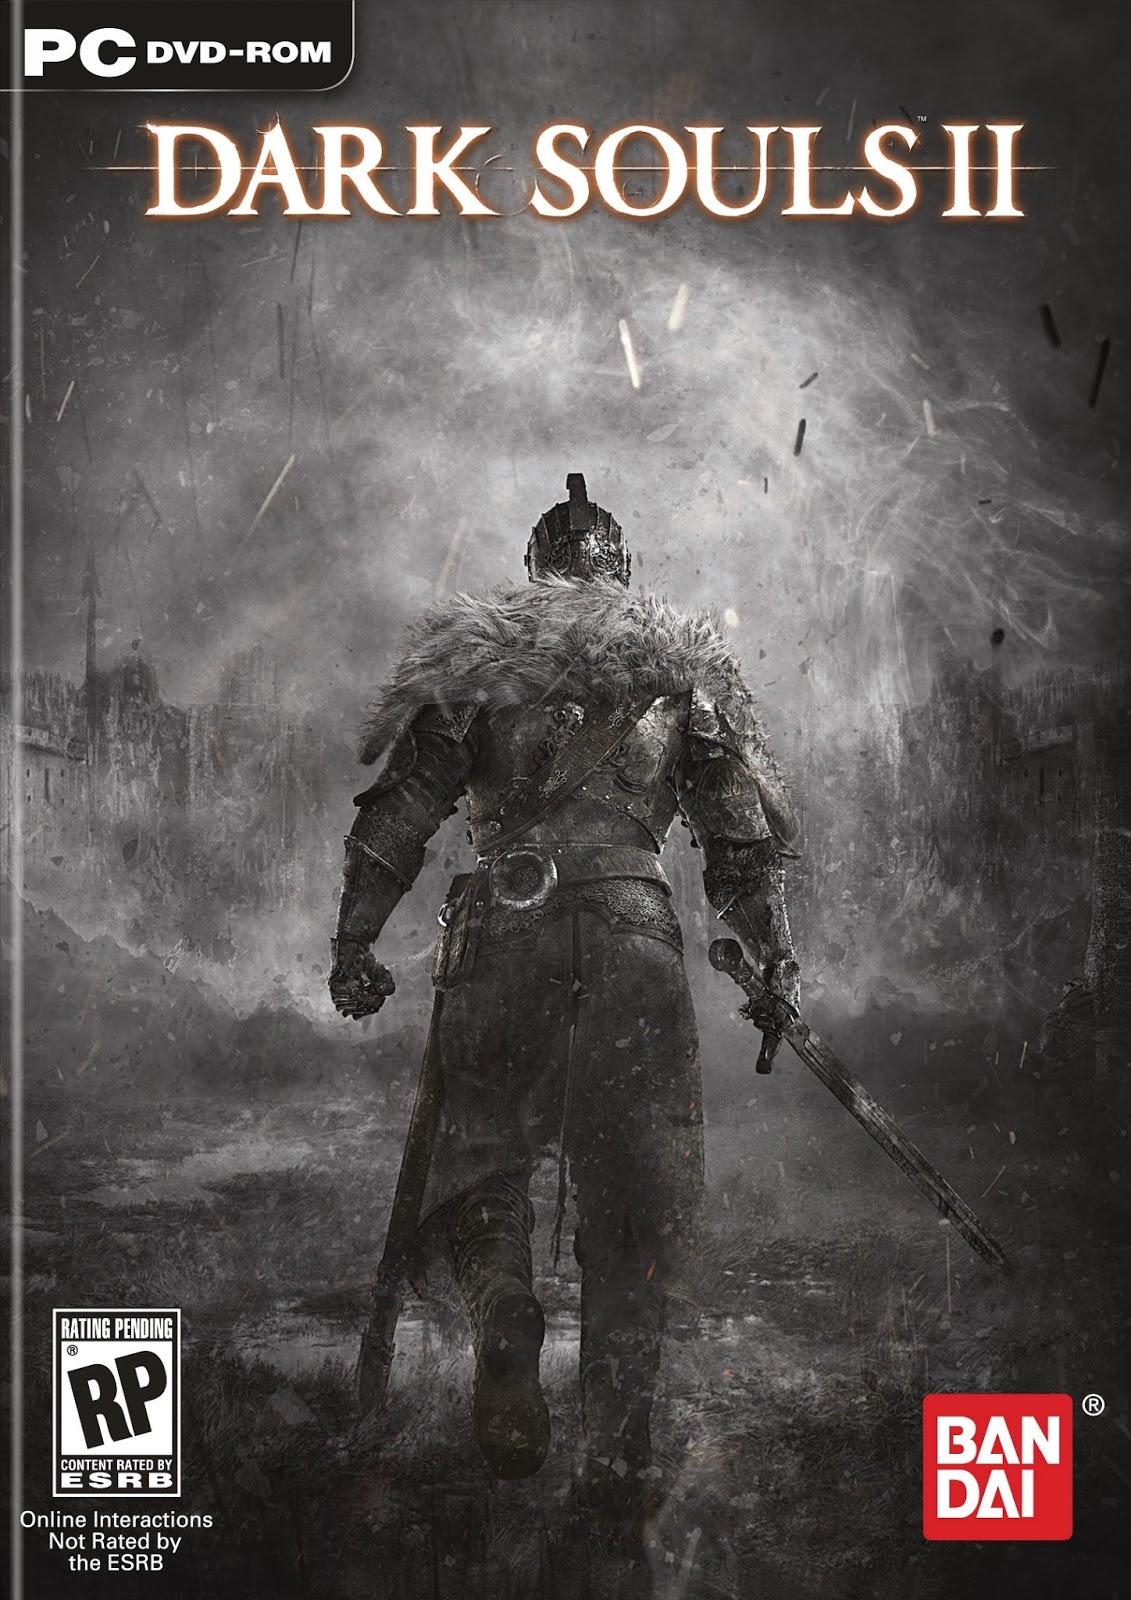 Dark Souls II PC Torrent - RELOADED  Keygen & Hack